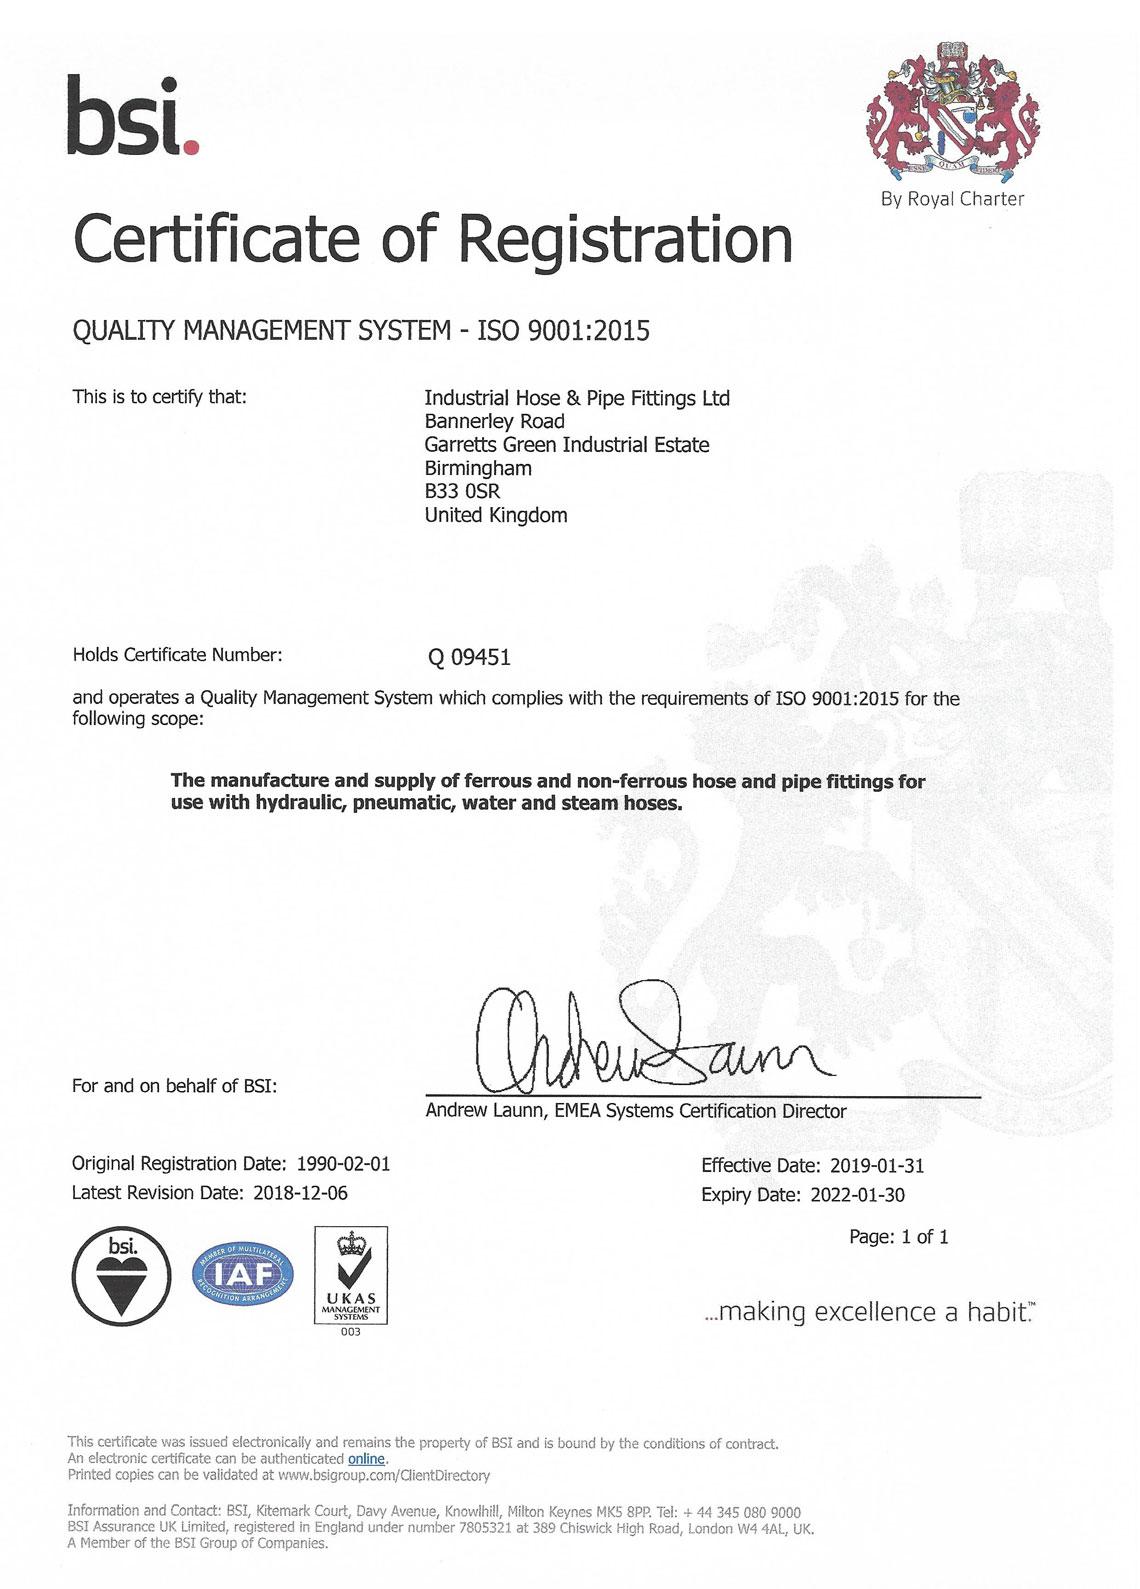 bsi certificate